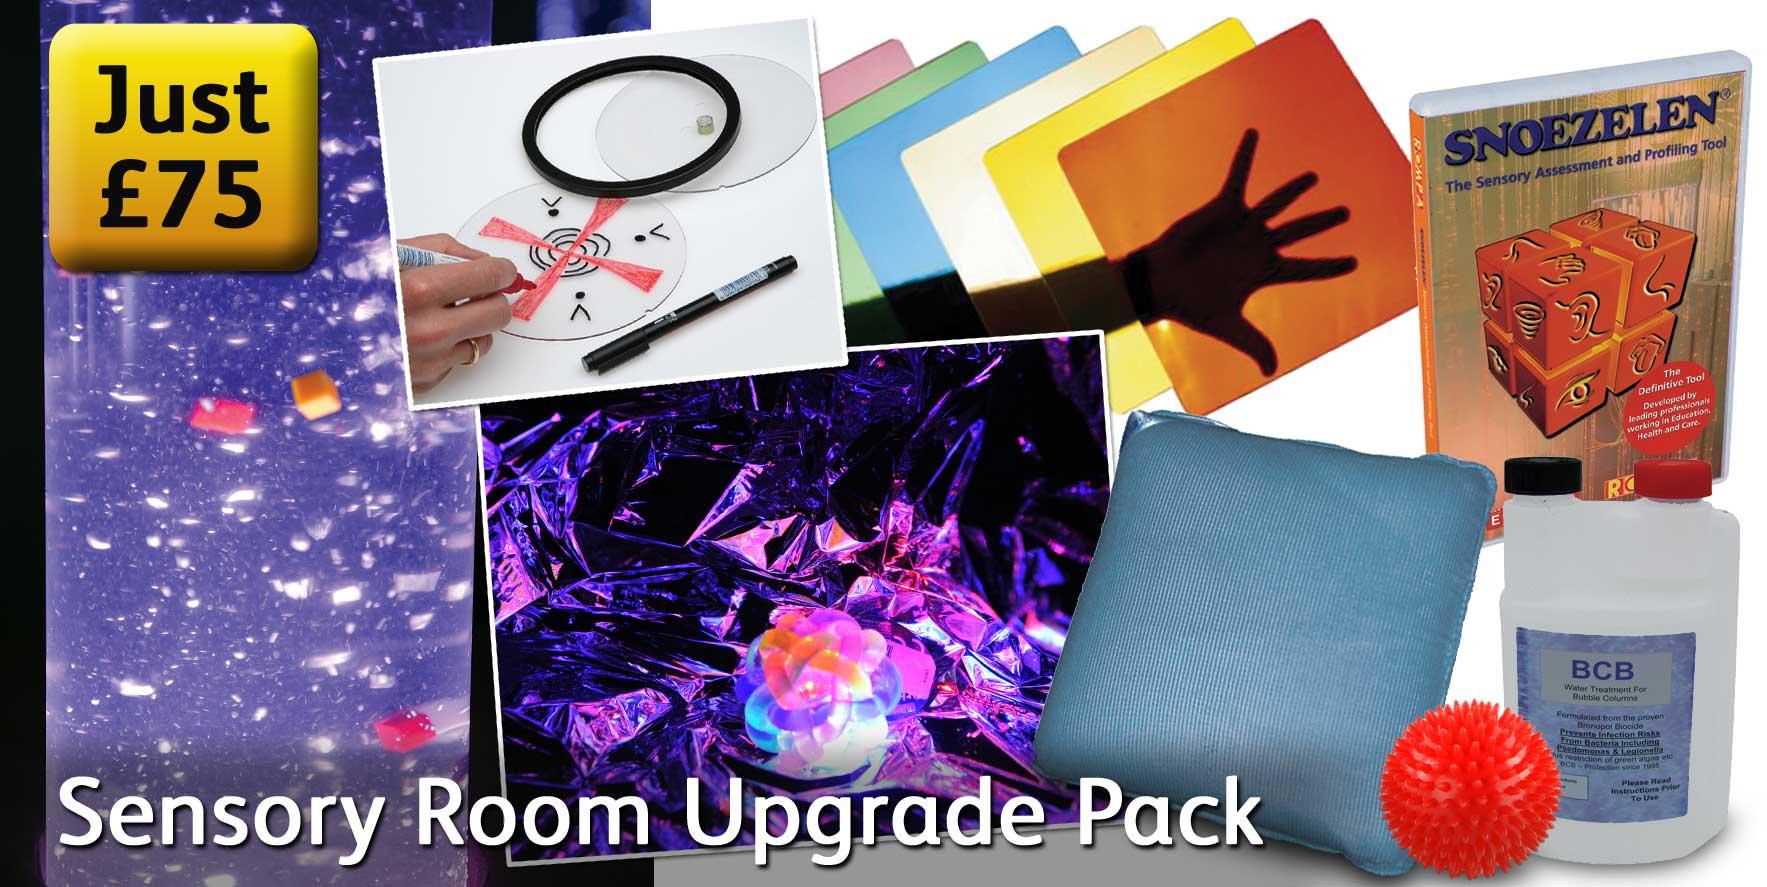 Sensory Room Upgrade Pack